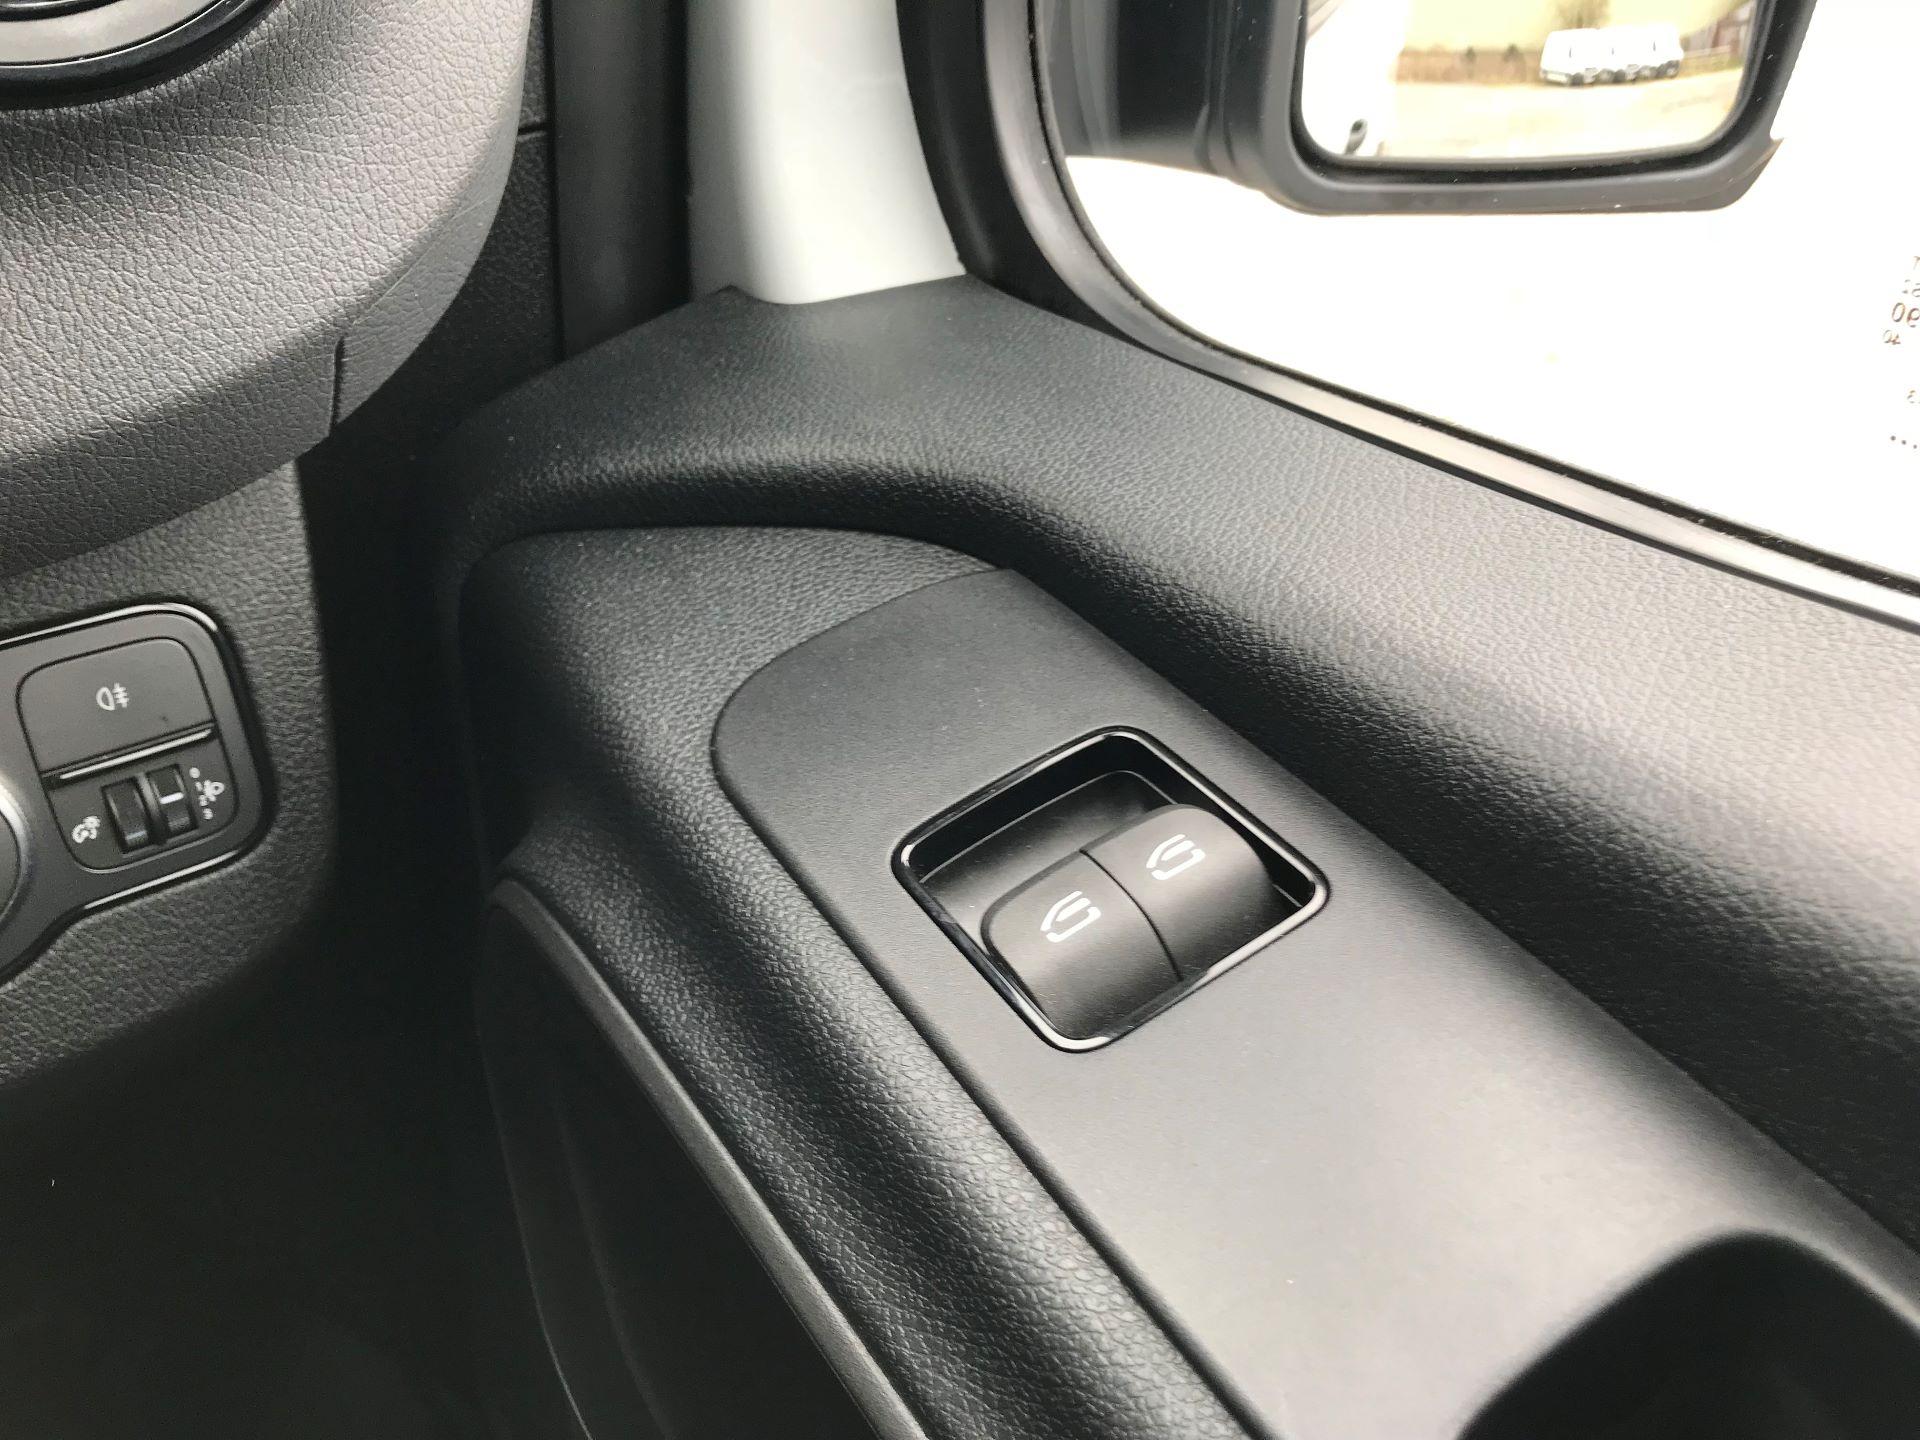 2019 Mercedes-Benz Sprinter 3.5T L2 H2 FWD Van (KM19TML) Image 30